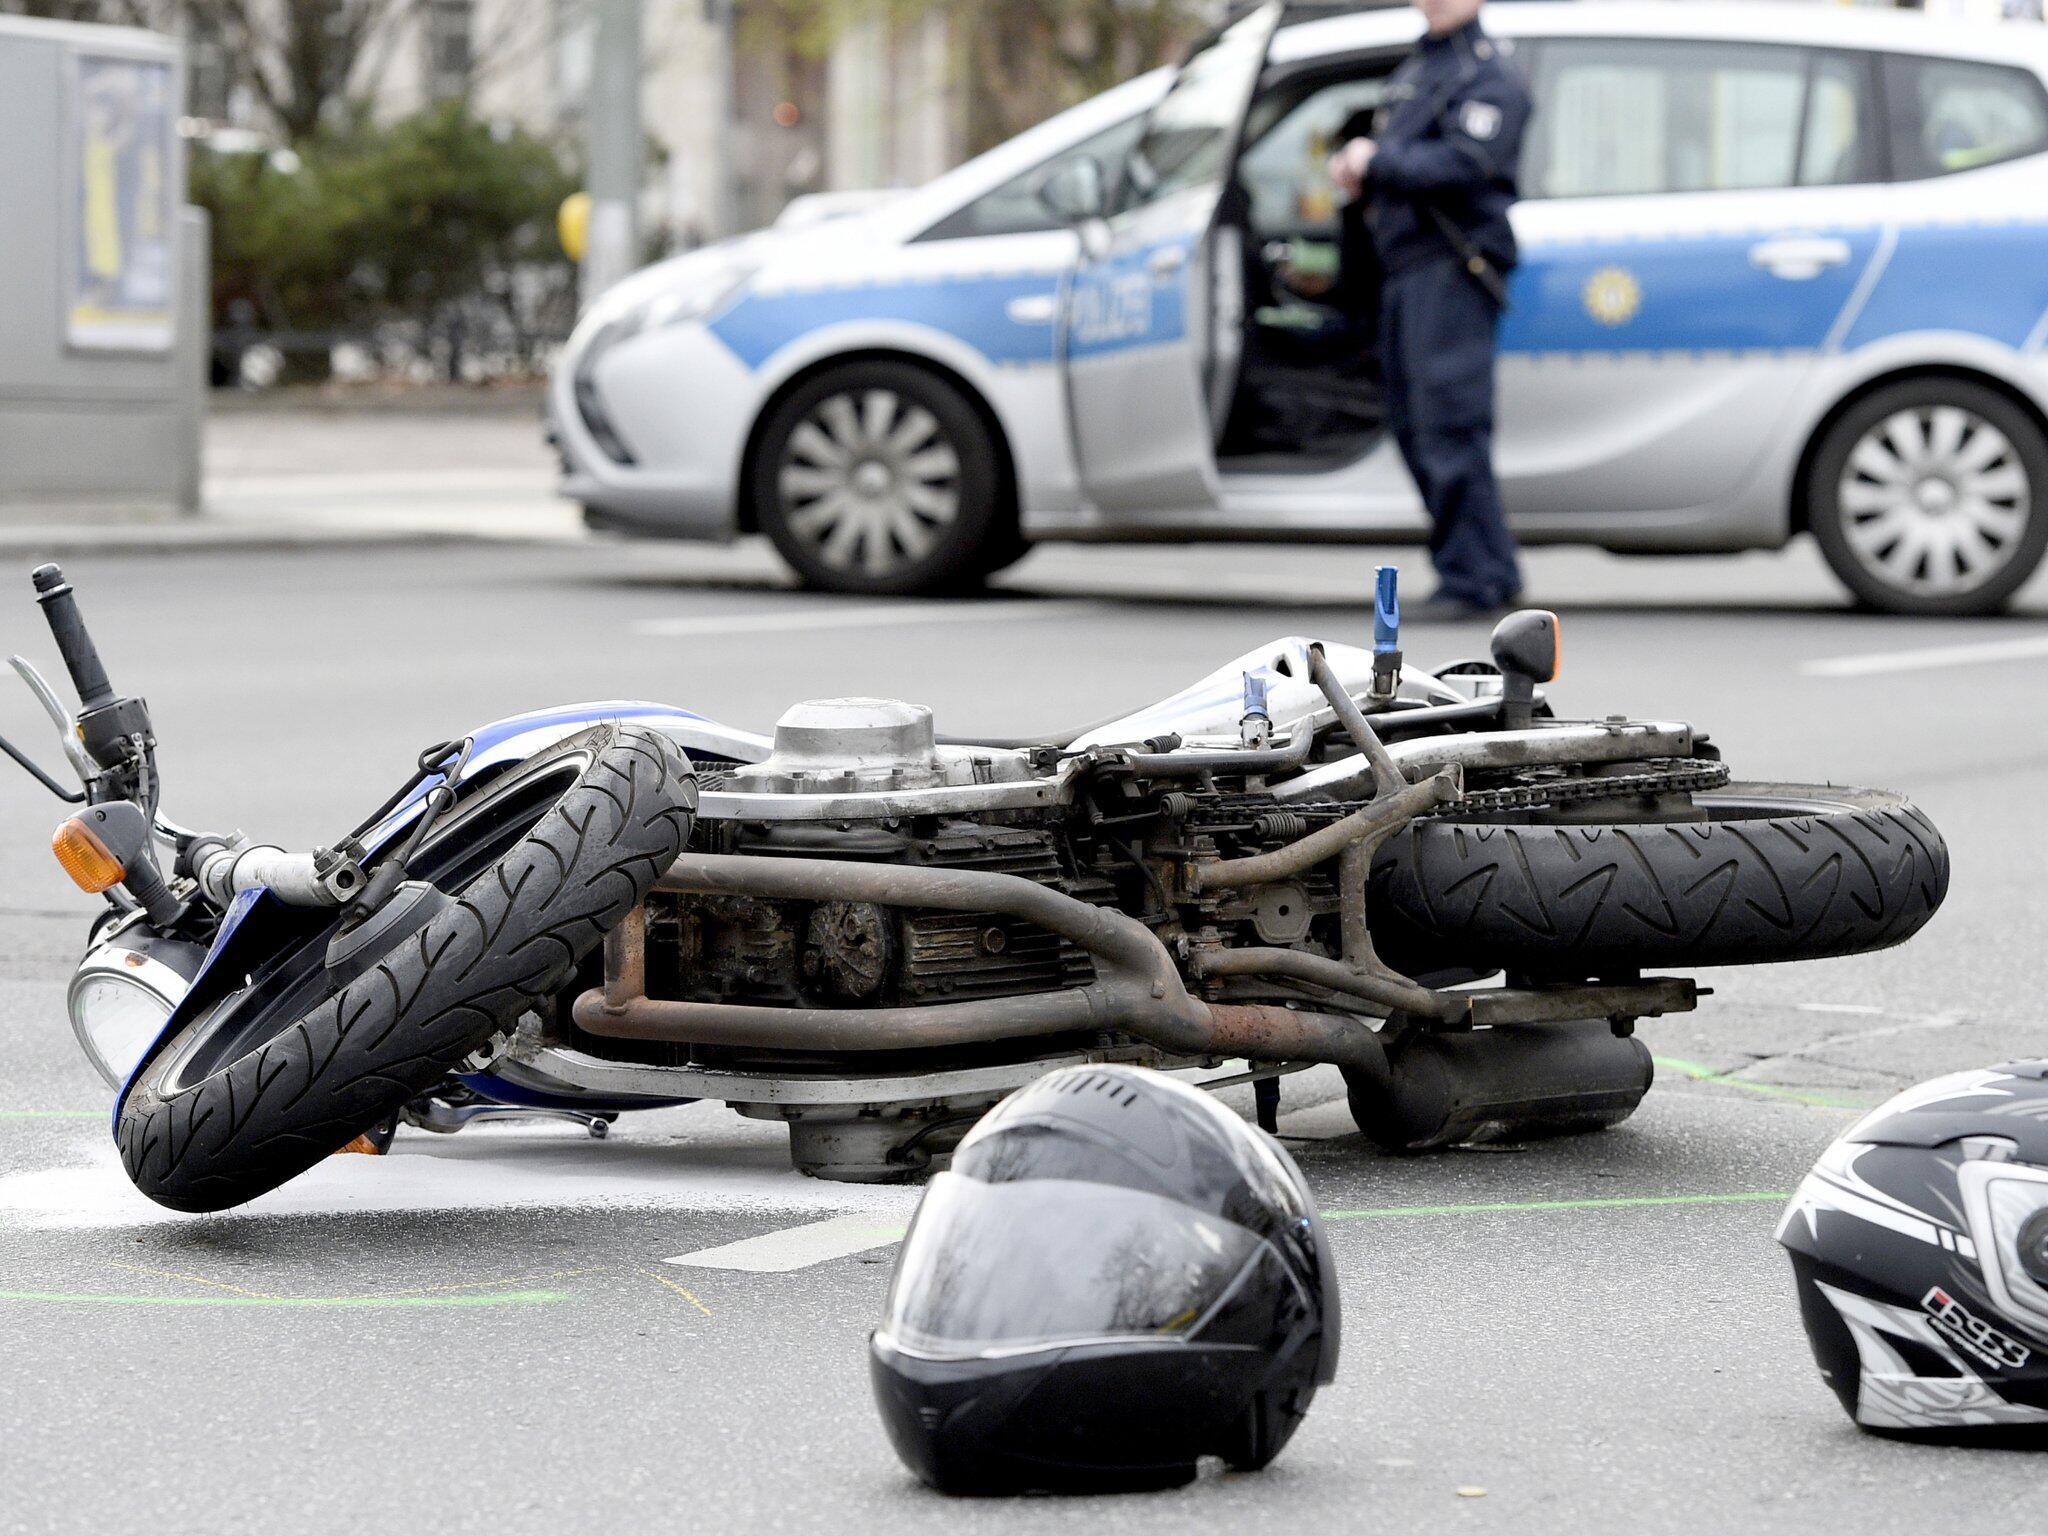 Bild zu Helme verunglückter Motorradfahrer